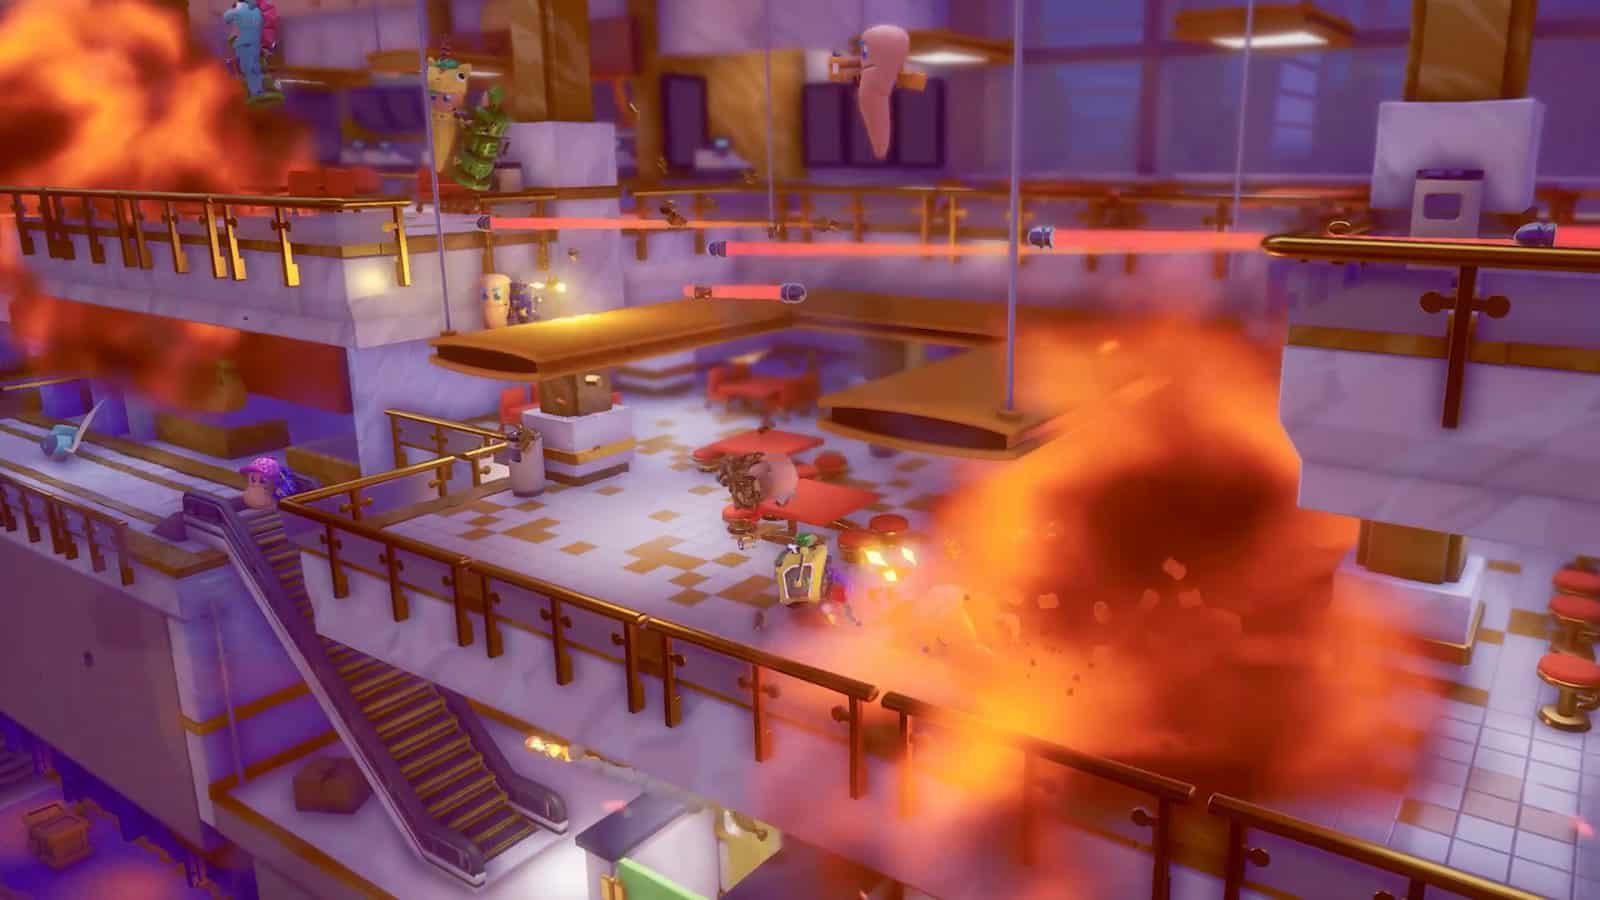 worms-rumble-screenshot-05-en-9jul20